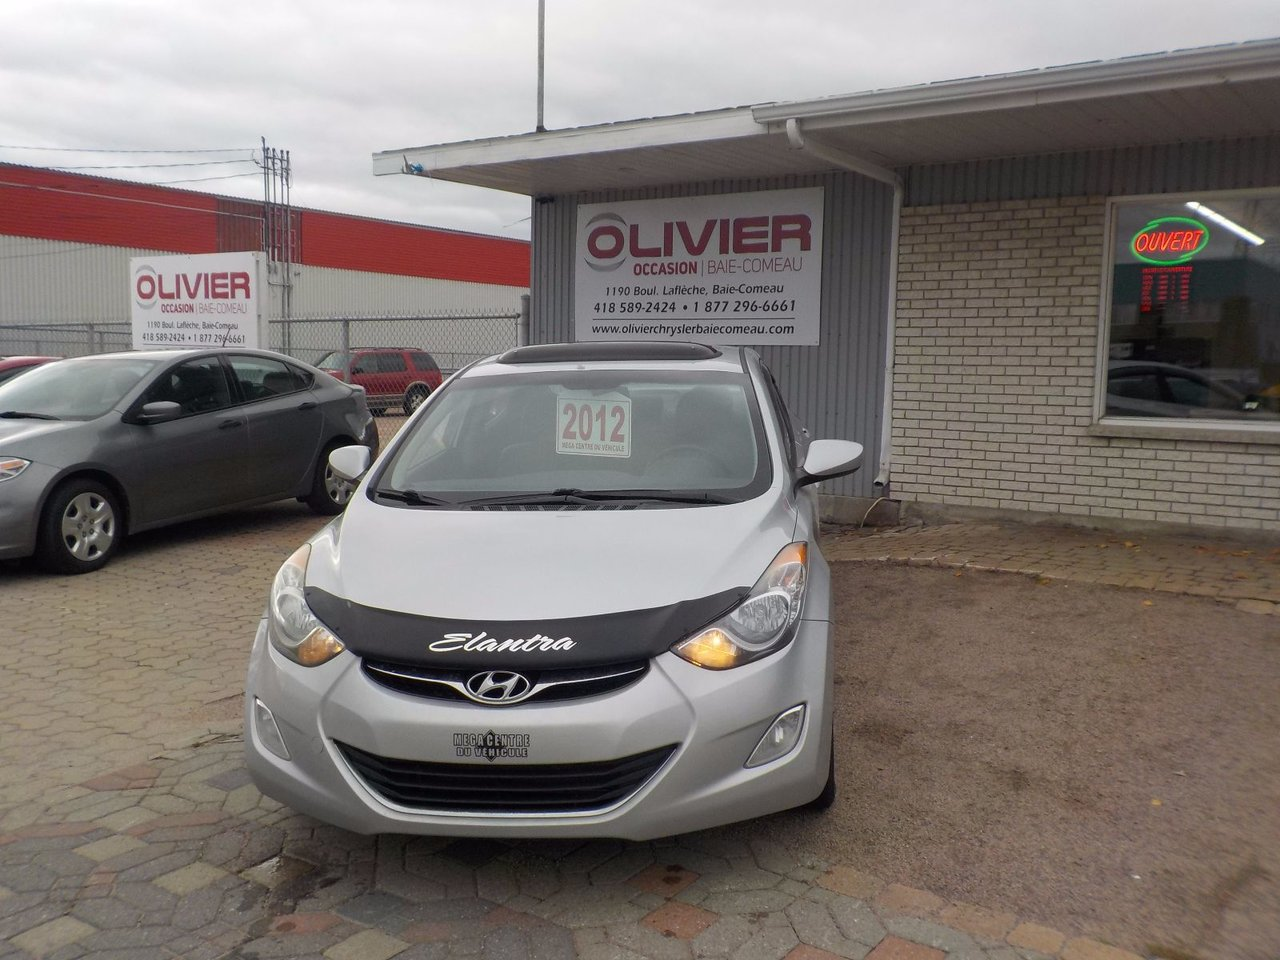 Hyundai elantra 2012 d 39 occasion vendre chez olivier for Nelson honda el monte